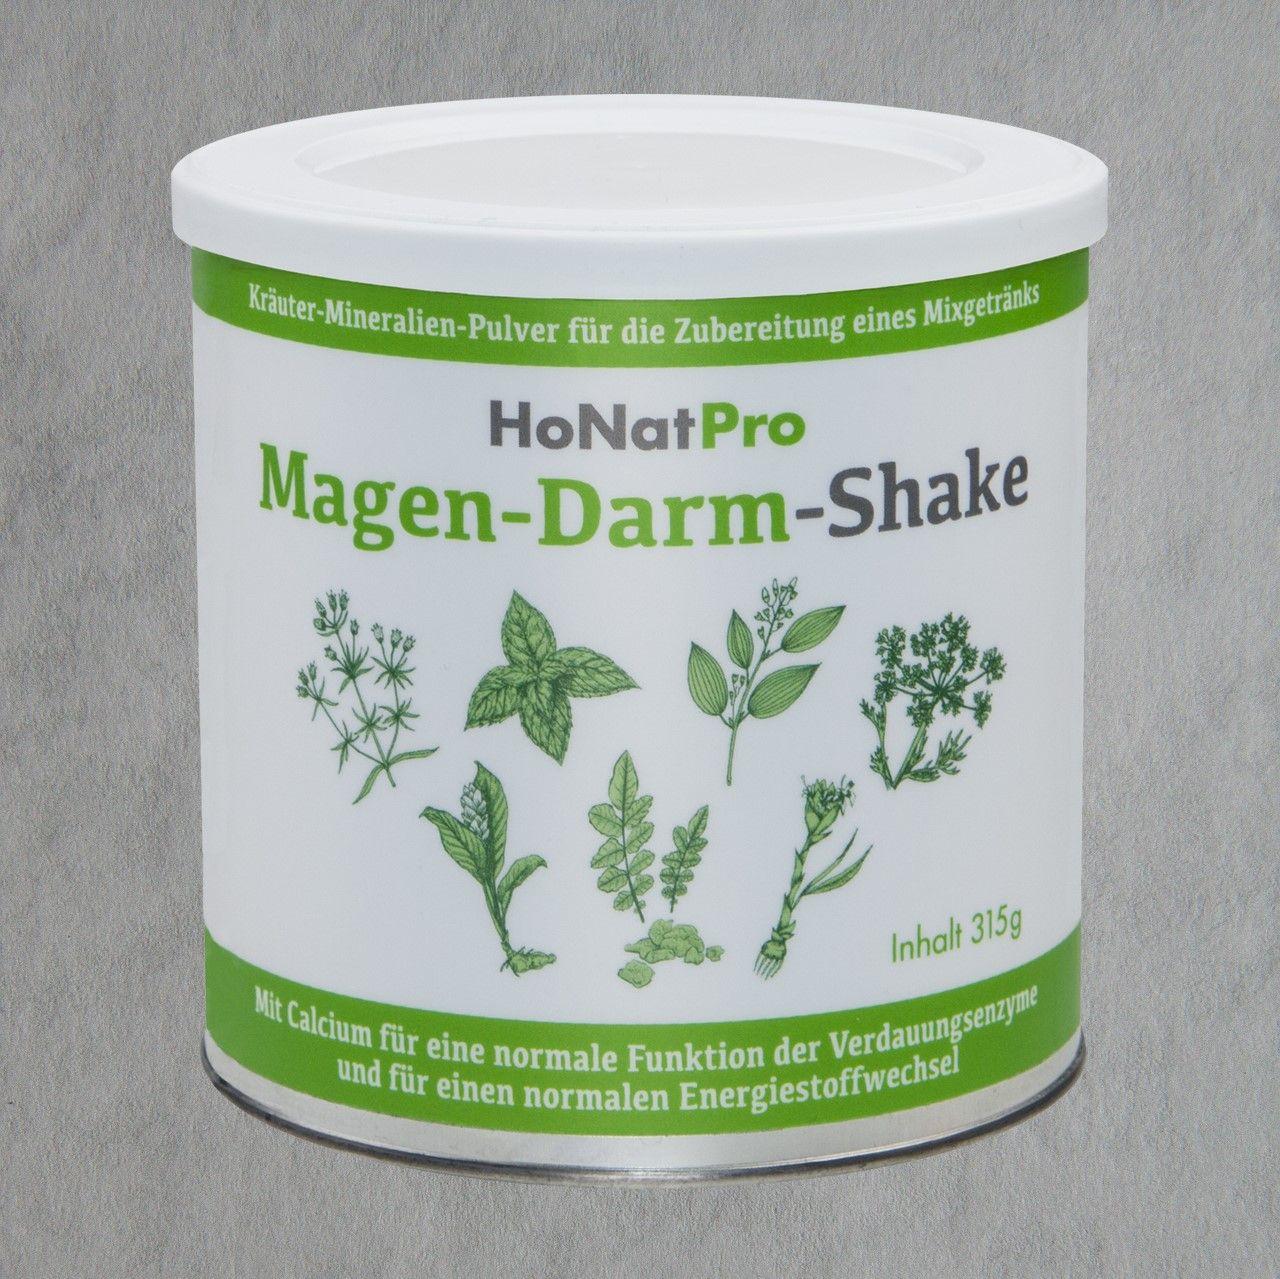 Honatpro Magen-Darm-Shake